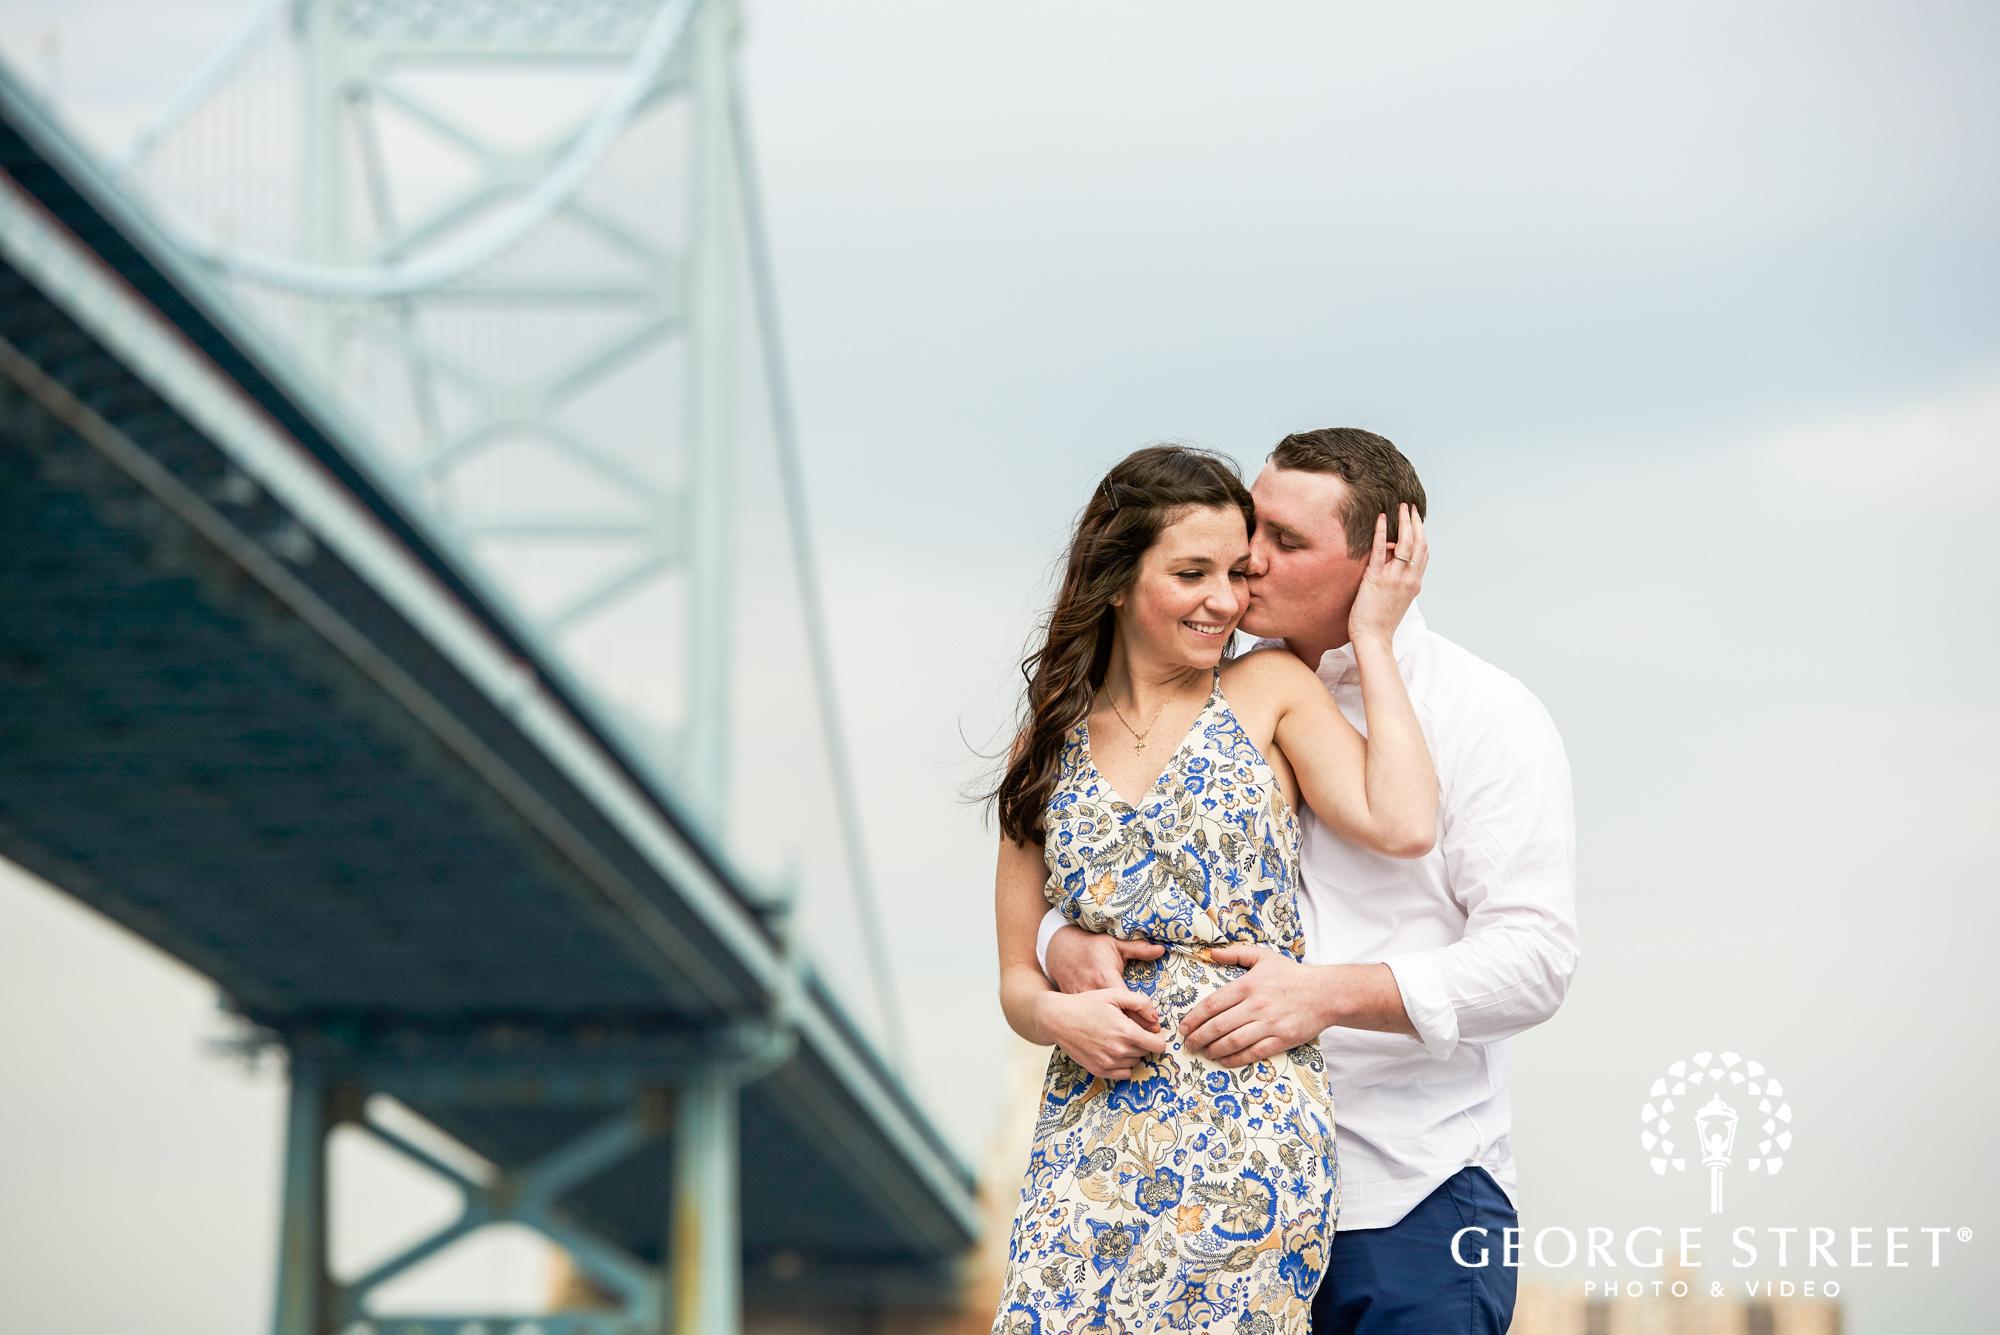 philadelphia engagement photos with benjamin franklin bridge